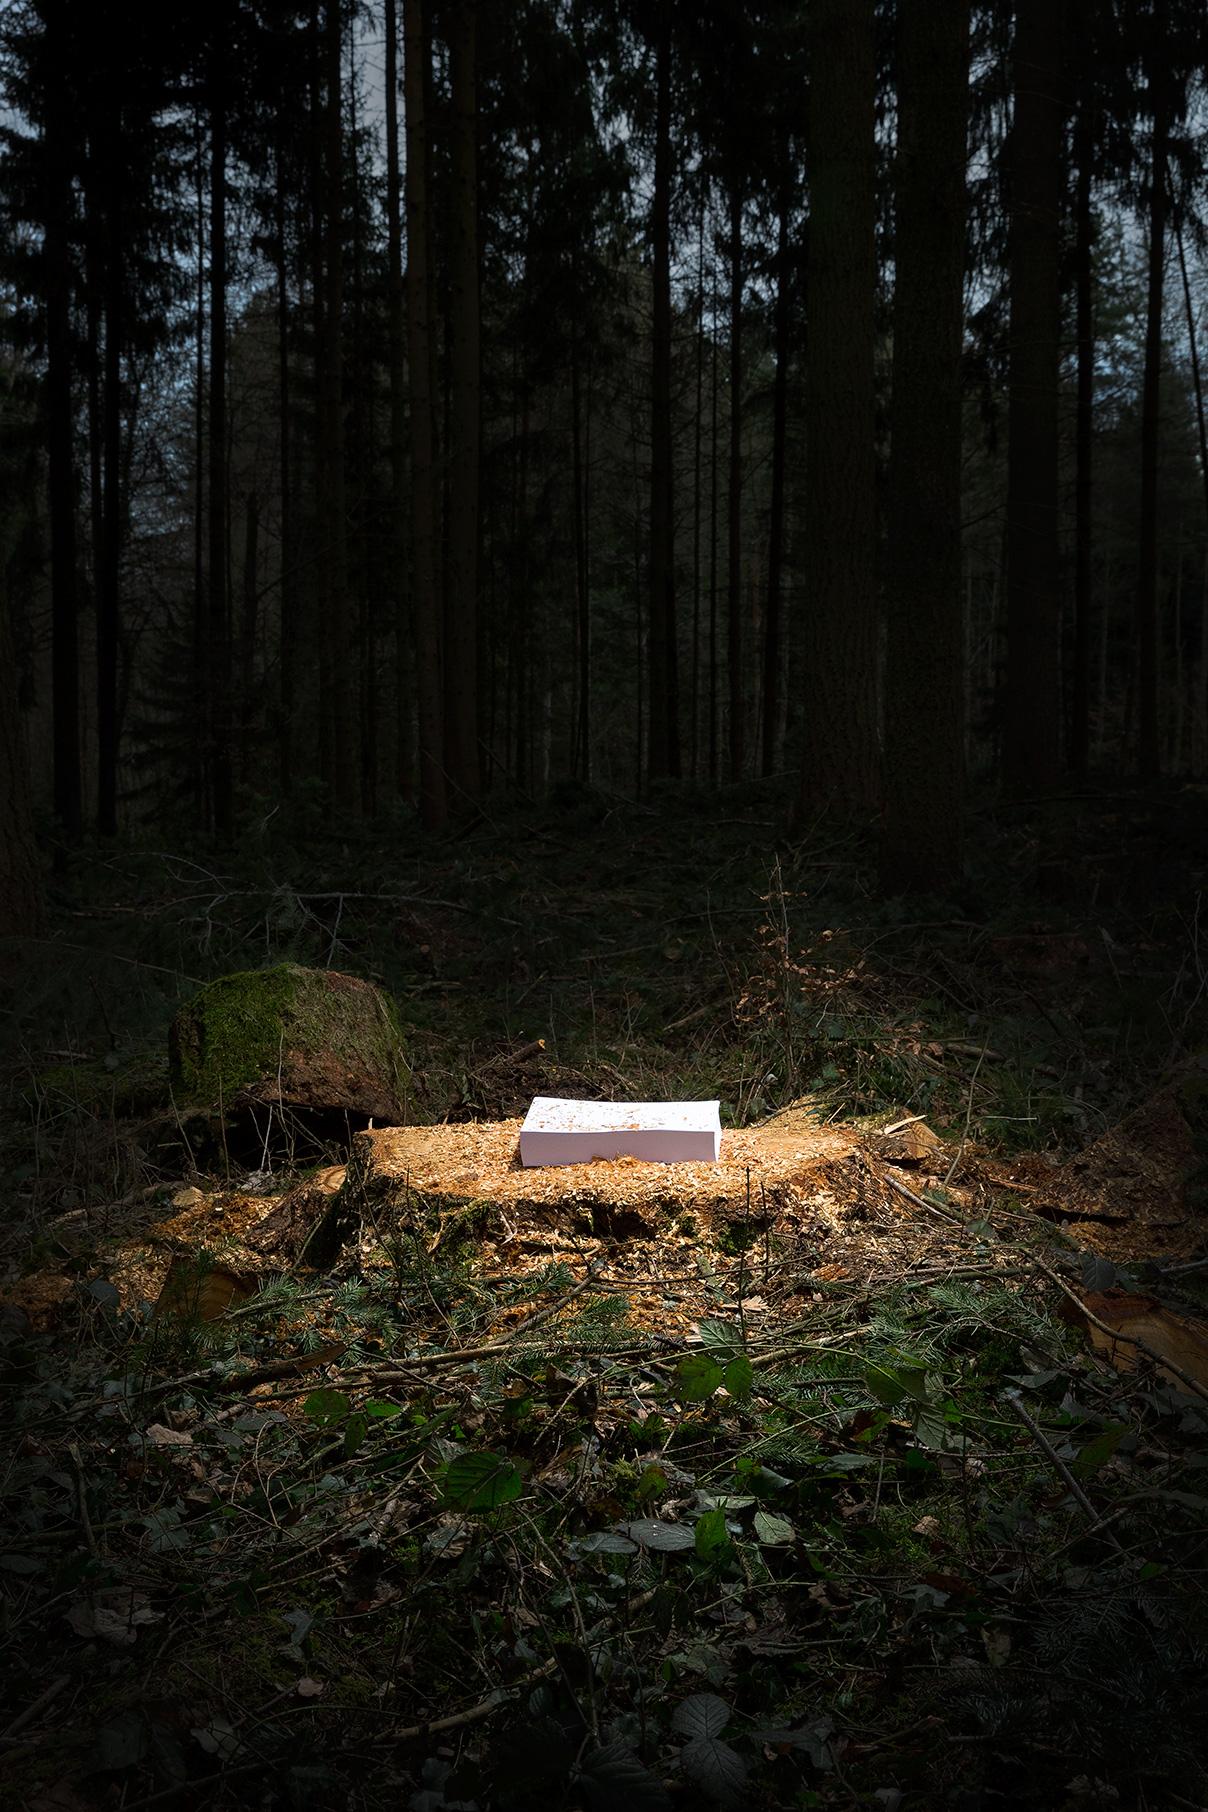 Rueedi-Luca-environmental-project-tree-paper.jpg